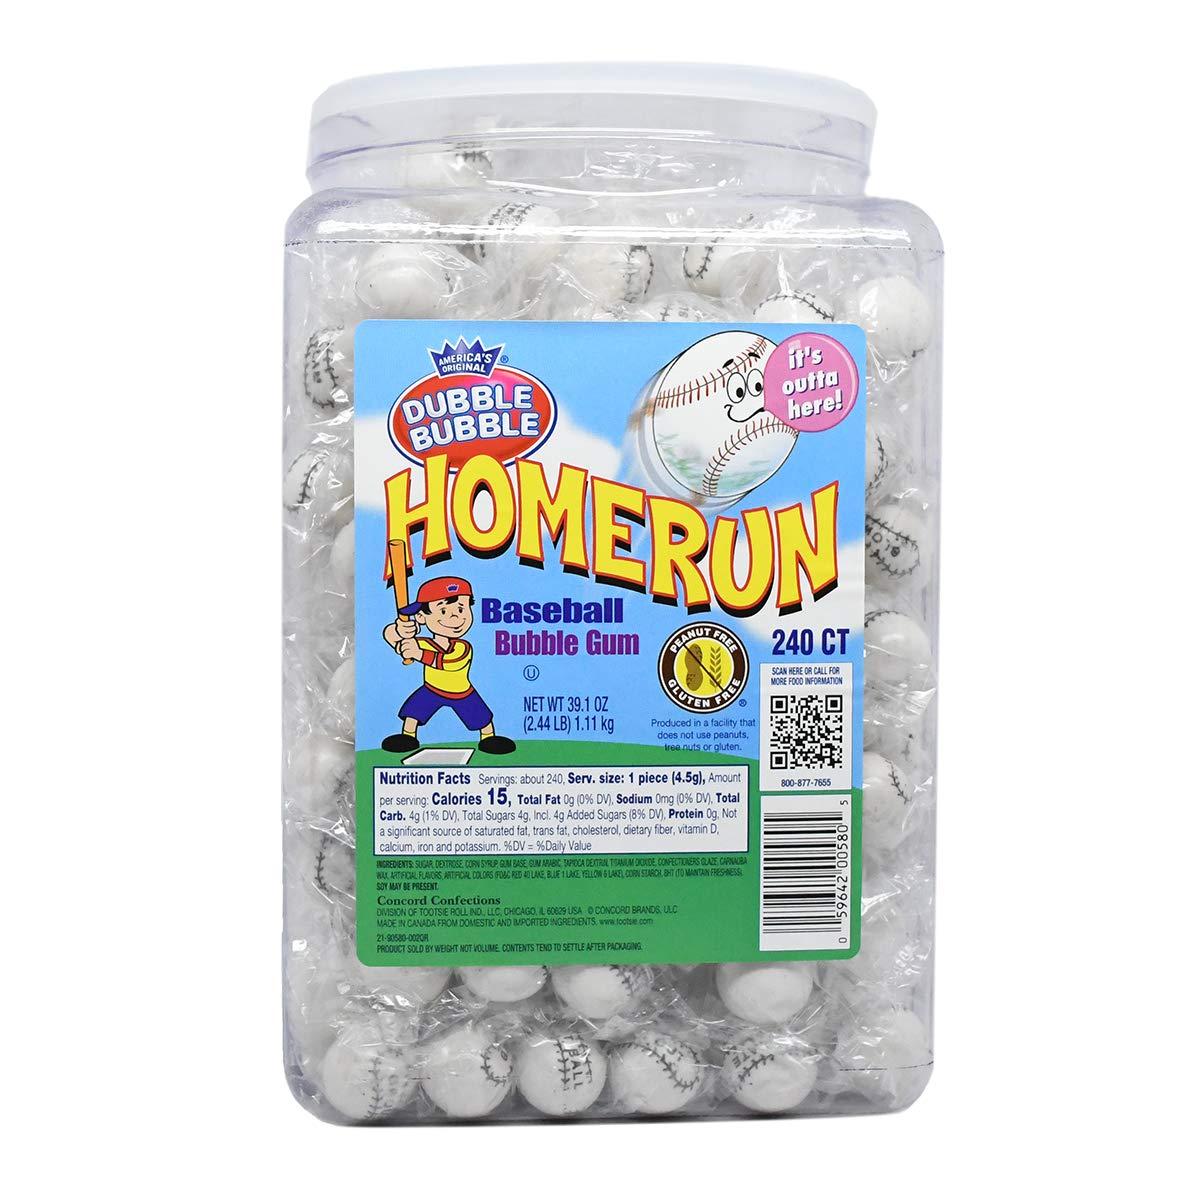 Dubble Bubble Home Run Baseball Bubble Gum Gumballs, 240-Count Jar